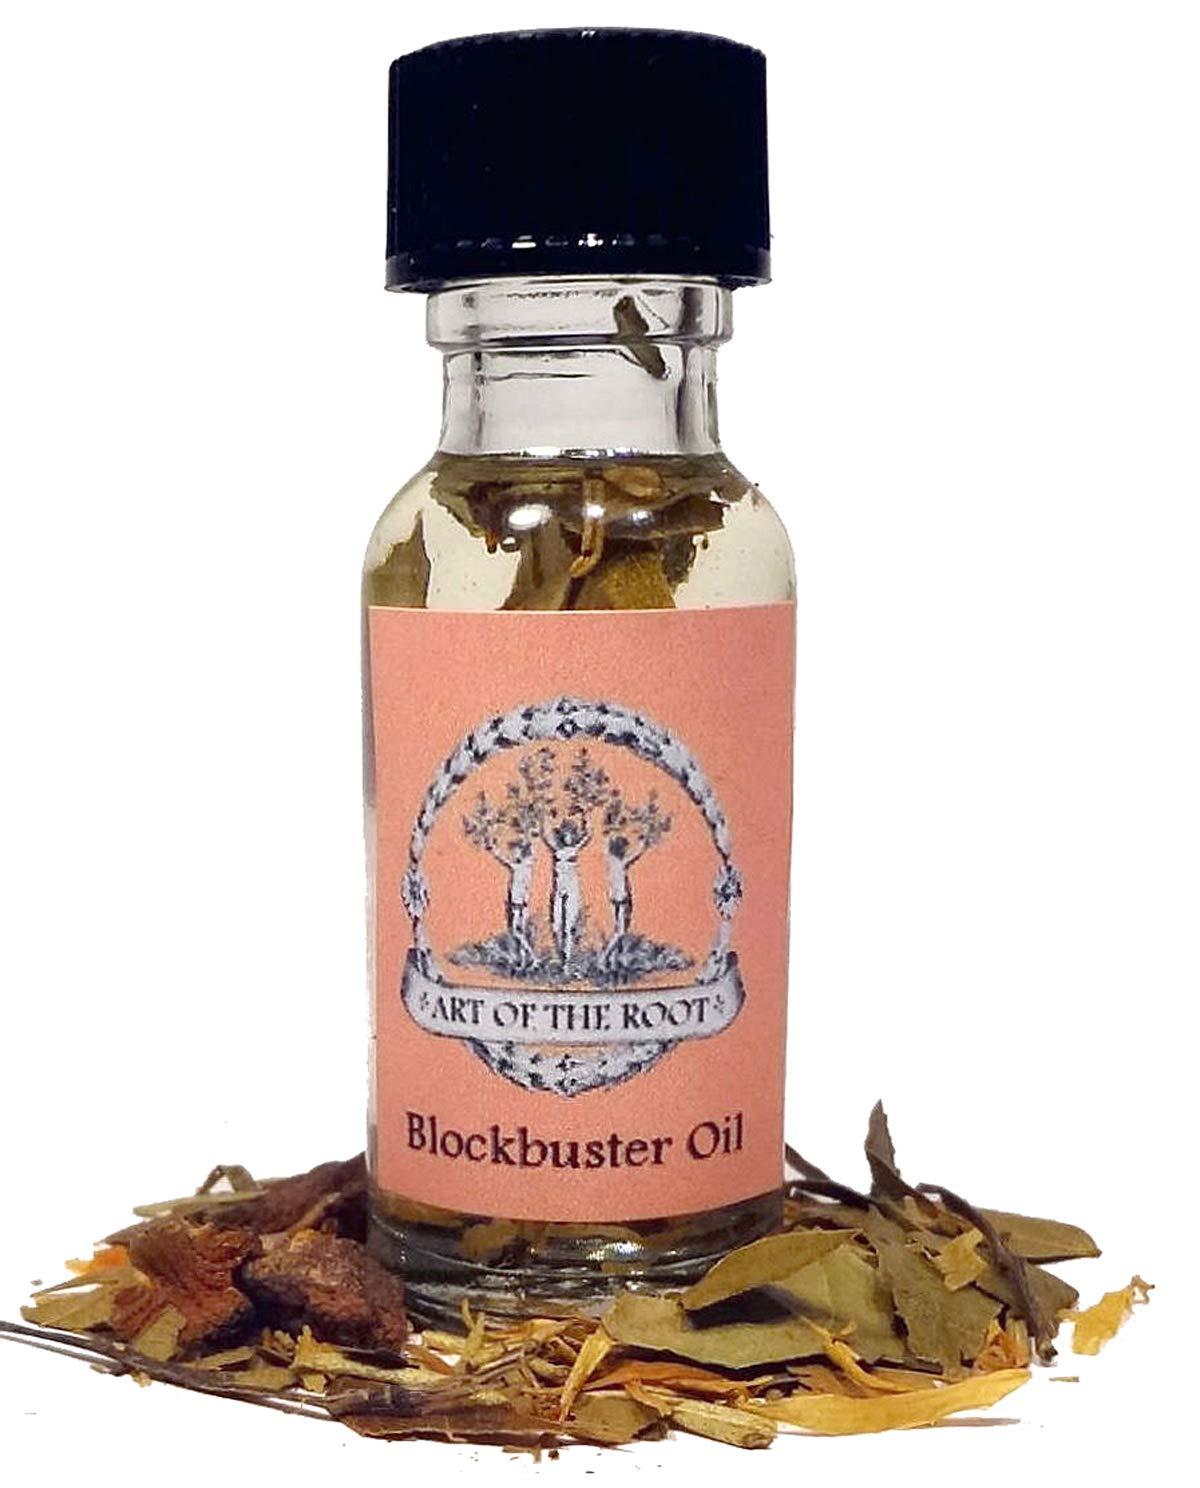 Blockbuster Oil 1/2 oz Hoodoo Voodoo Wicca Pagan Santeria